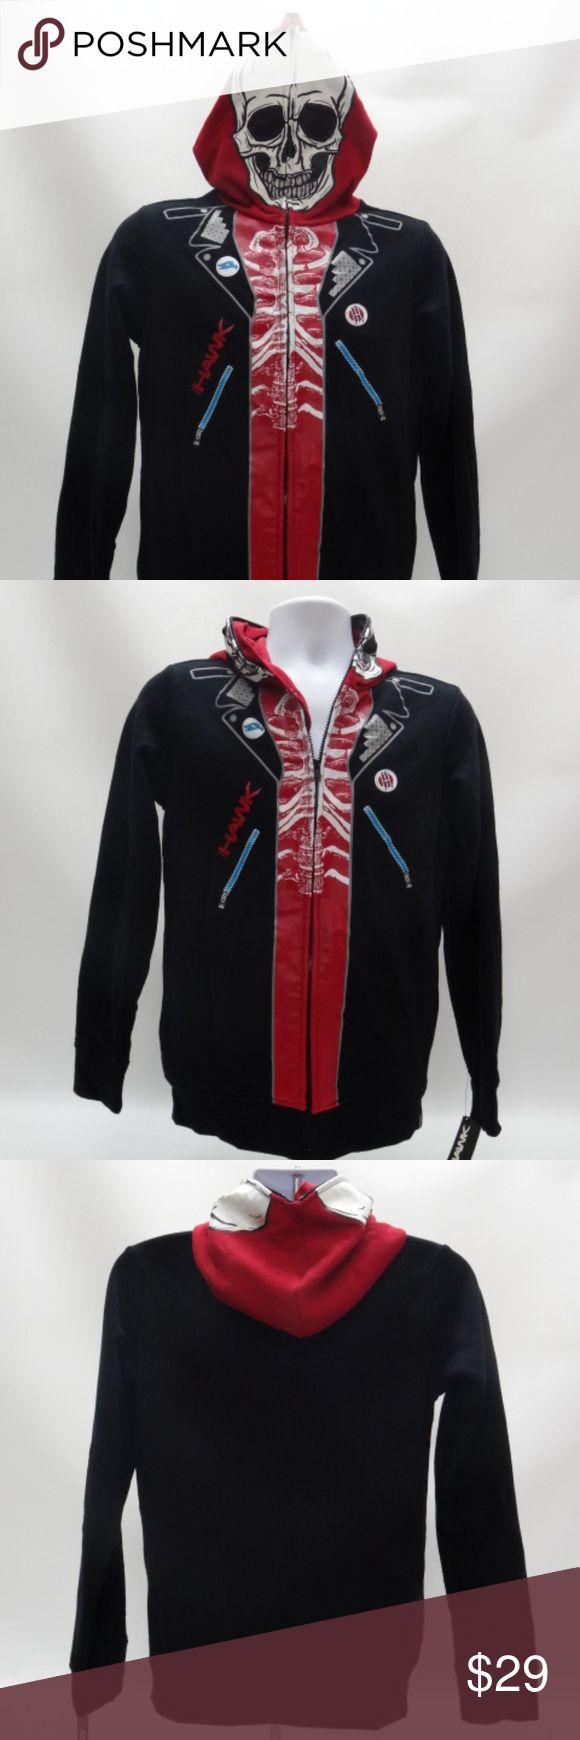 Spotted while shopping on Poshmark: Tony Hawk Creeper Black Zippered Hoodie! #poshmark #fashion #shopping #style #Tony Hawk #Other